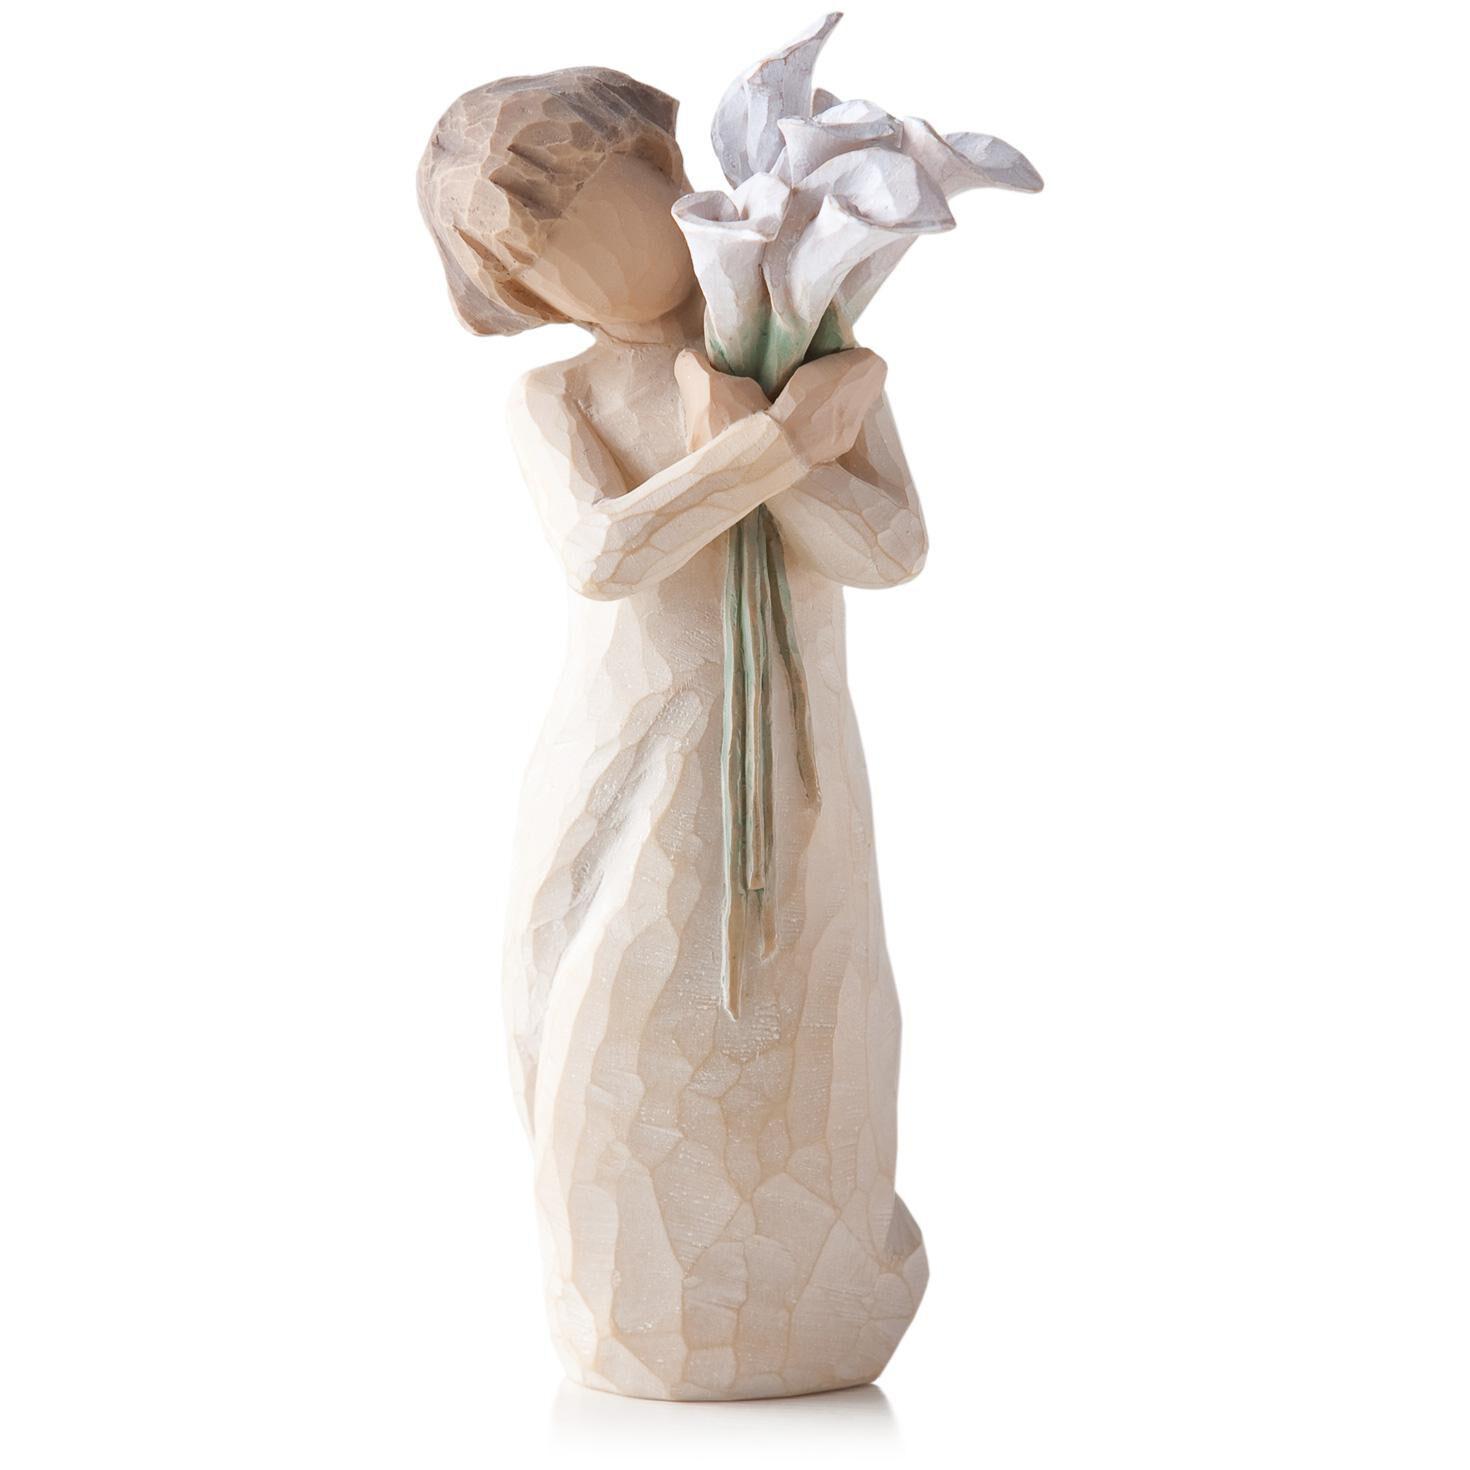 willow tree beautiful wishes figurine figurines hallmark. Black Bedroom Furniture Sets. Home Design Ideas